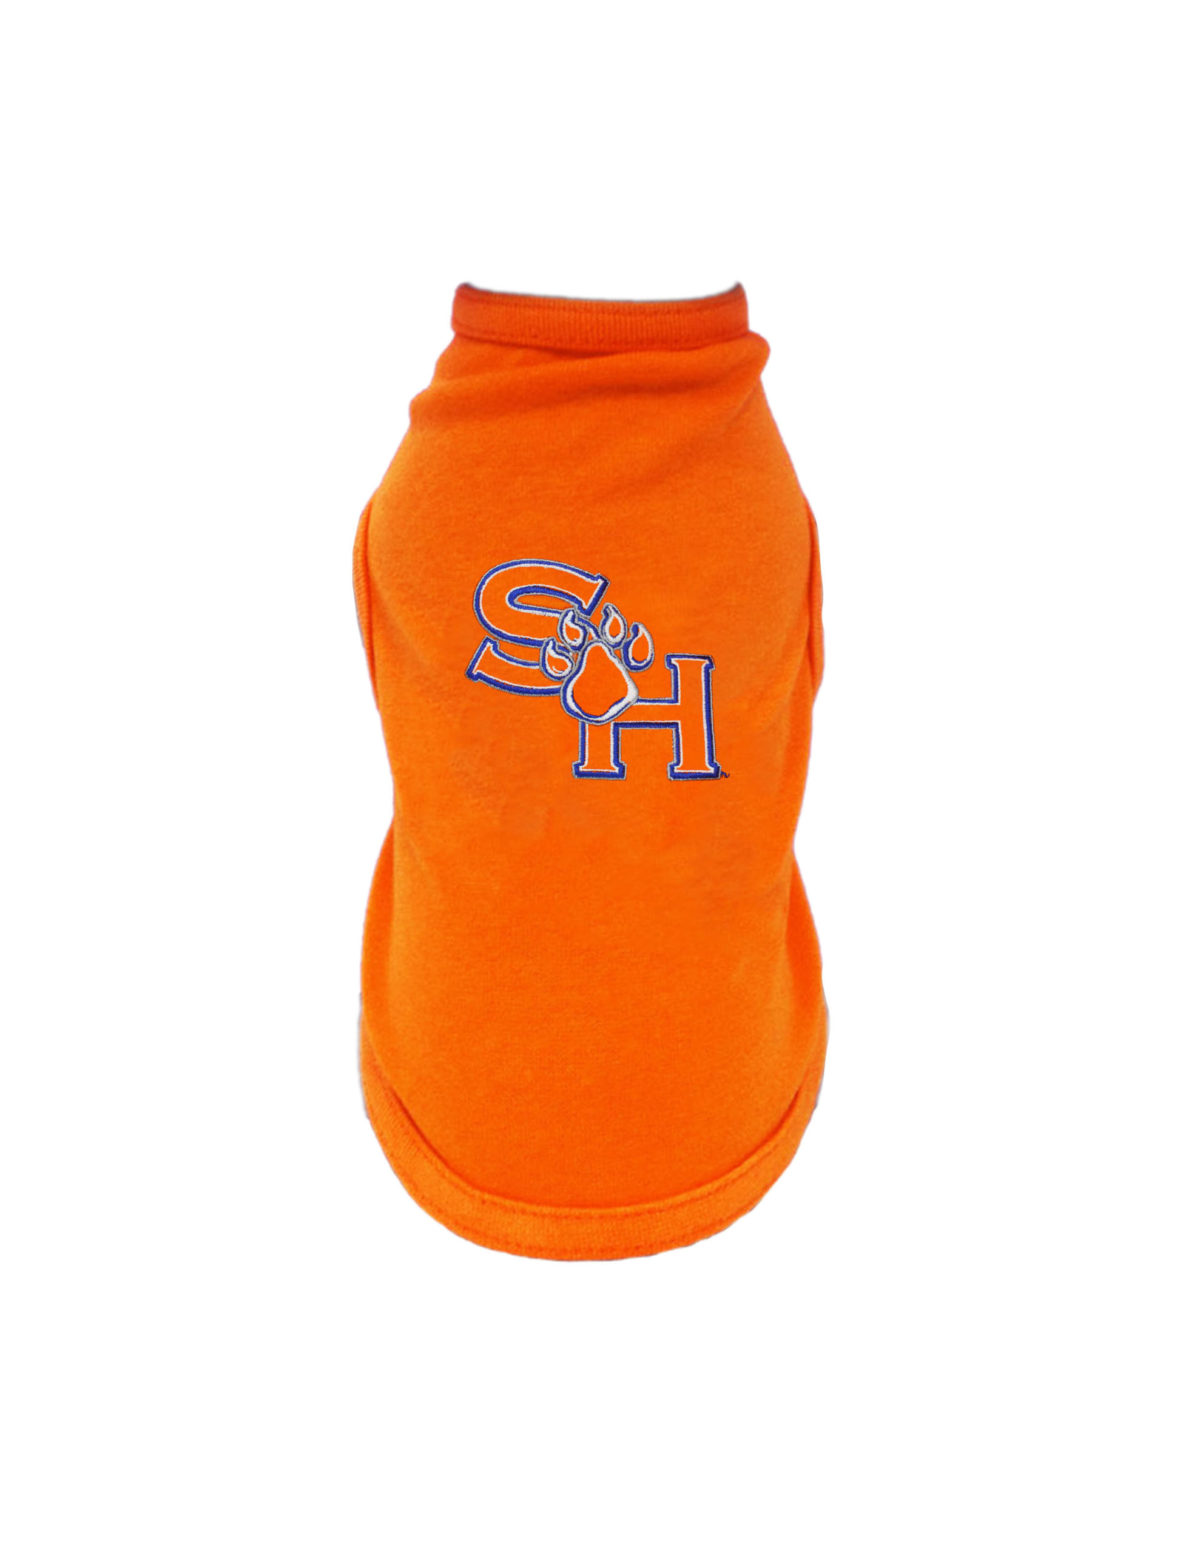 SHSU Sam Houston Dog Shirt Barefoot Campus Outfitter